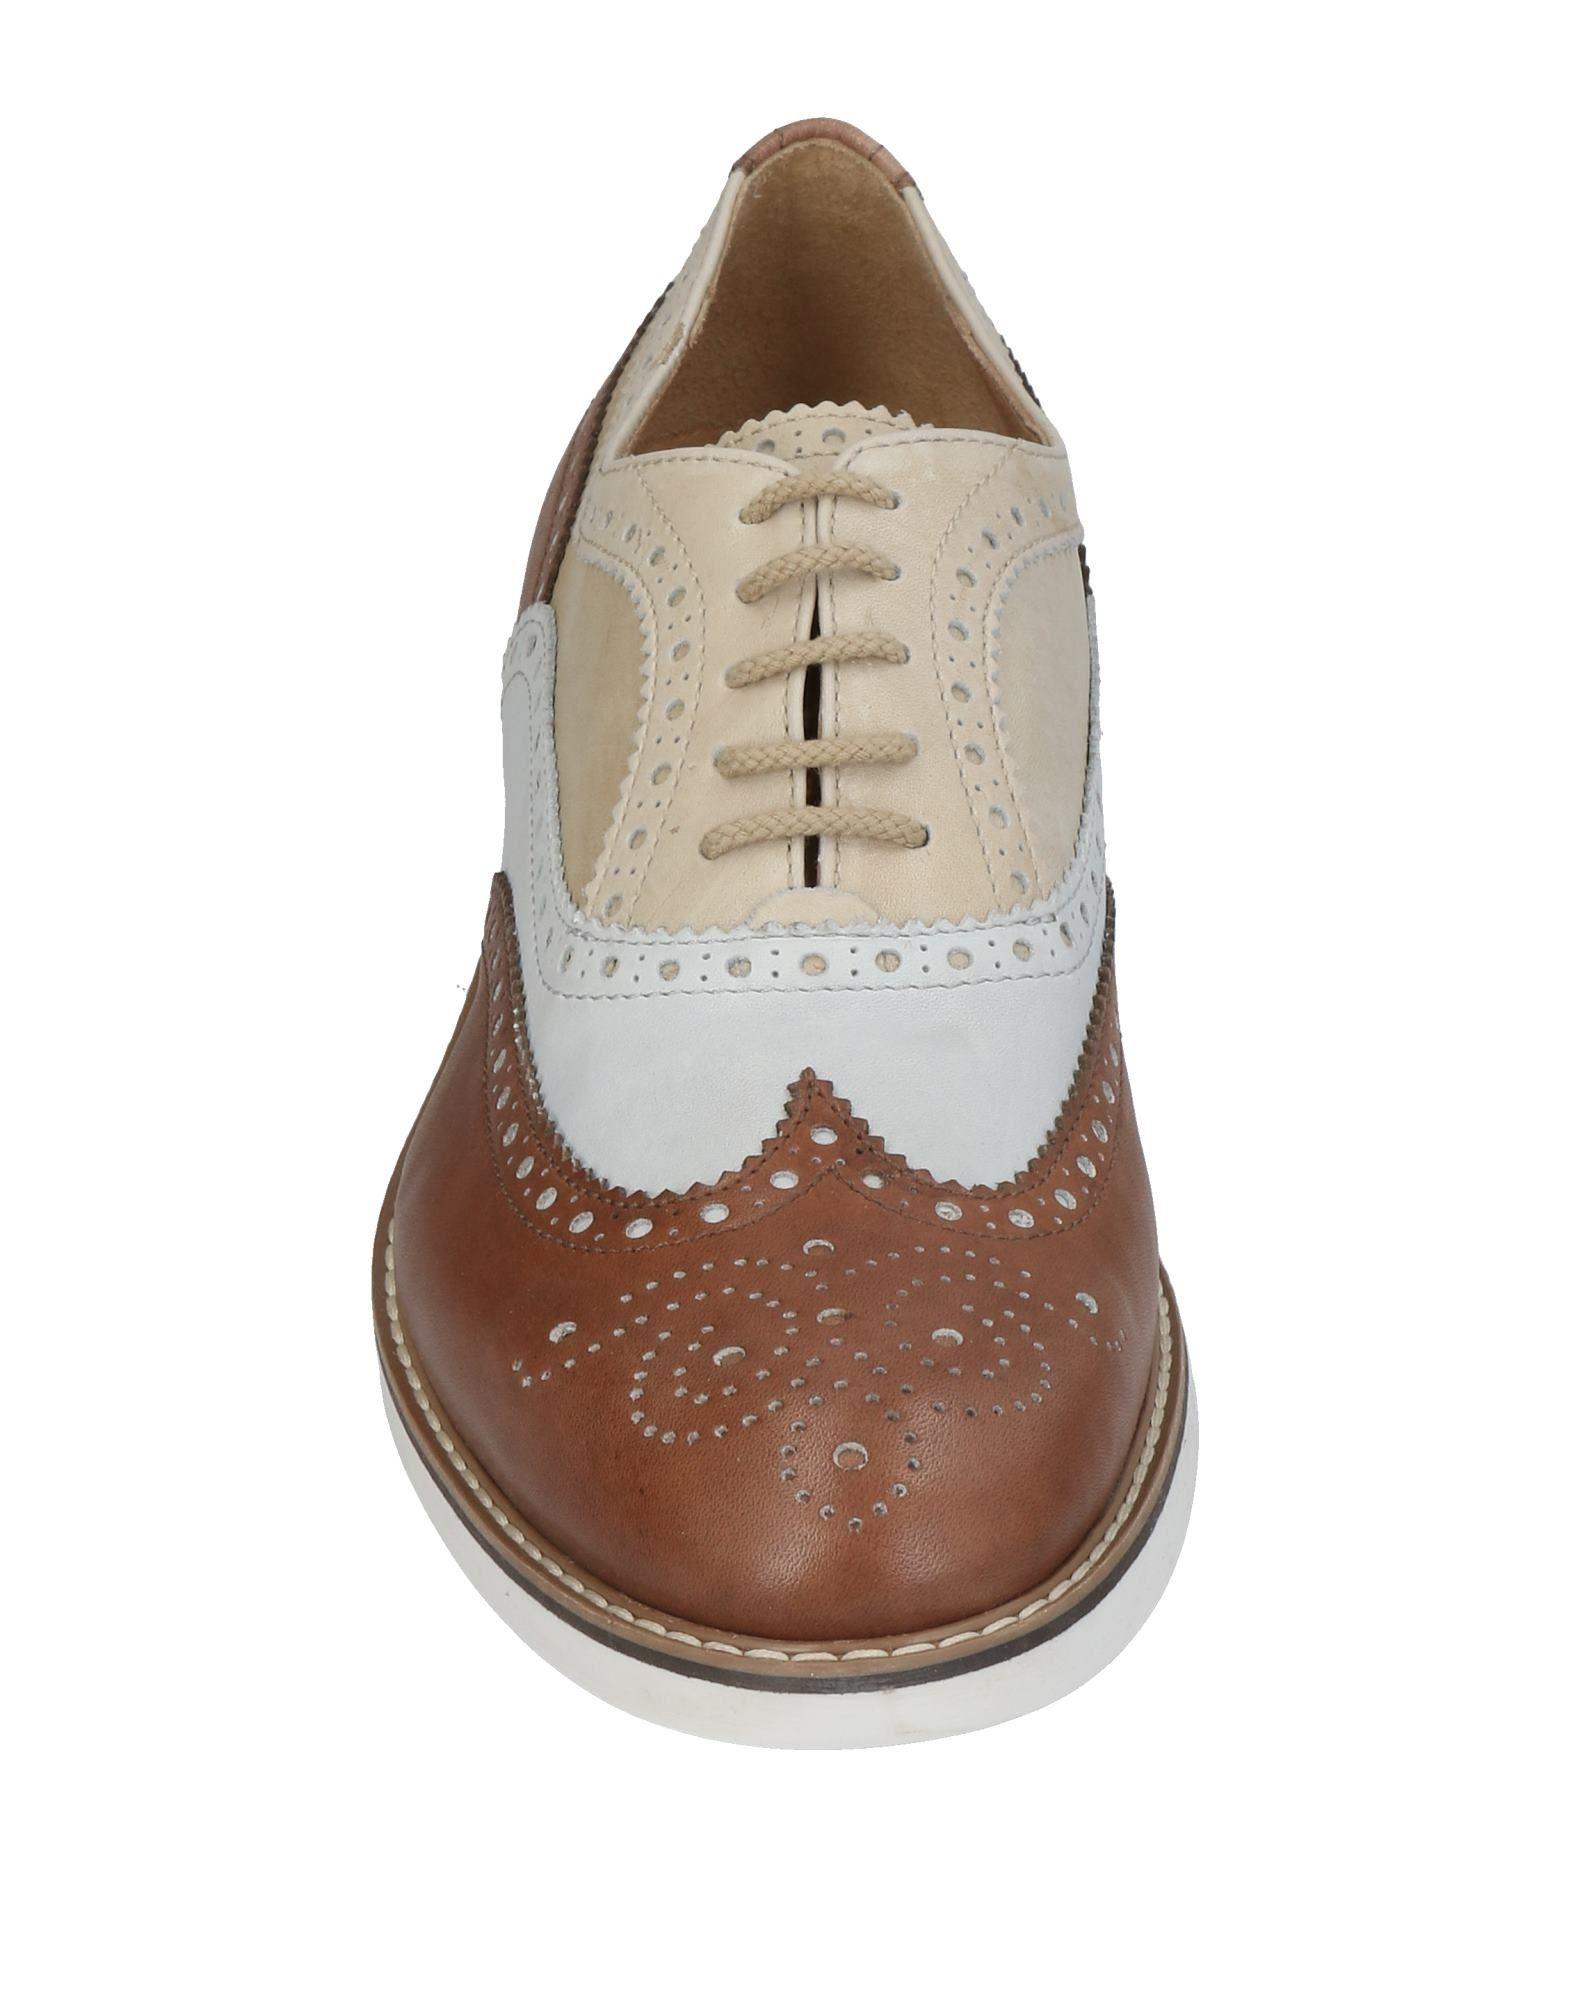 Docksteps Heiße Schnürschuhe Herren  11421871CV Heiße Docksteps Schuhe e84121